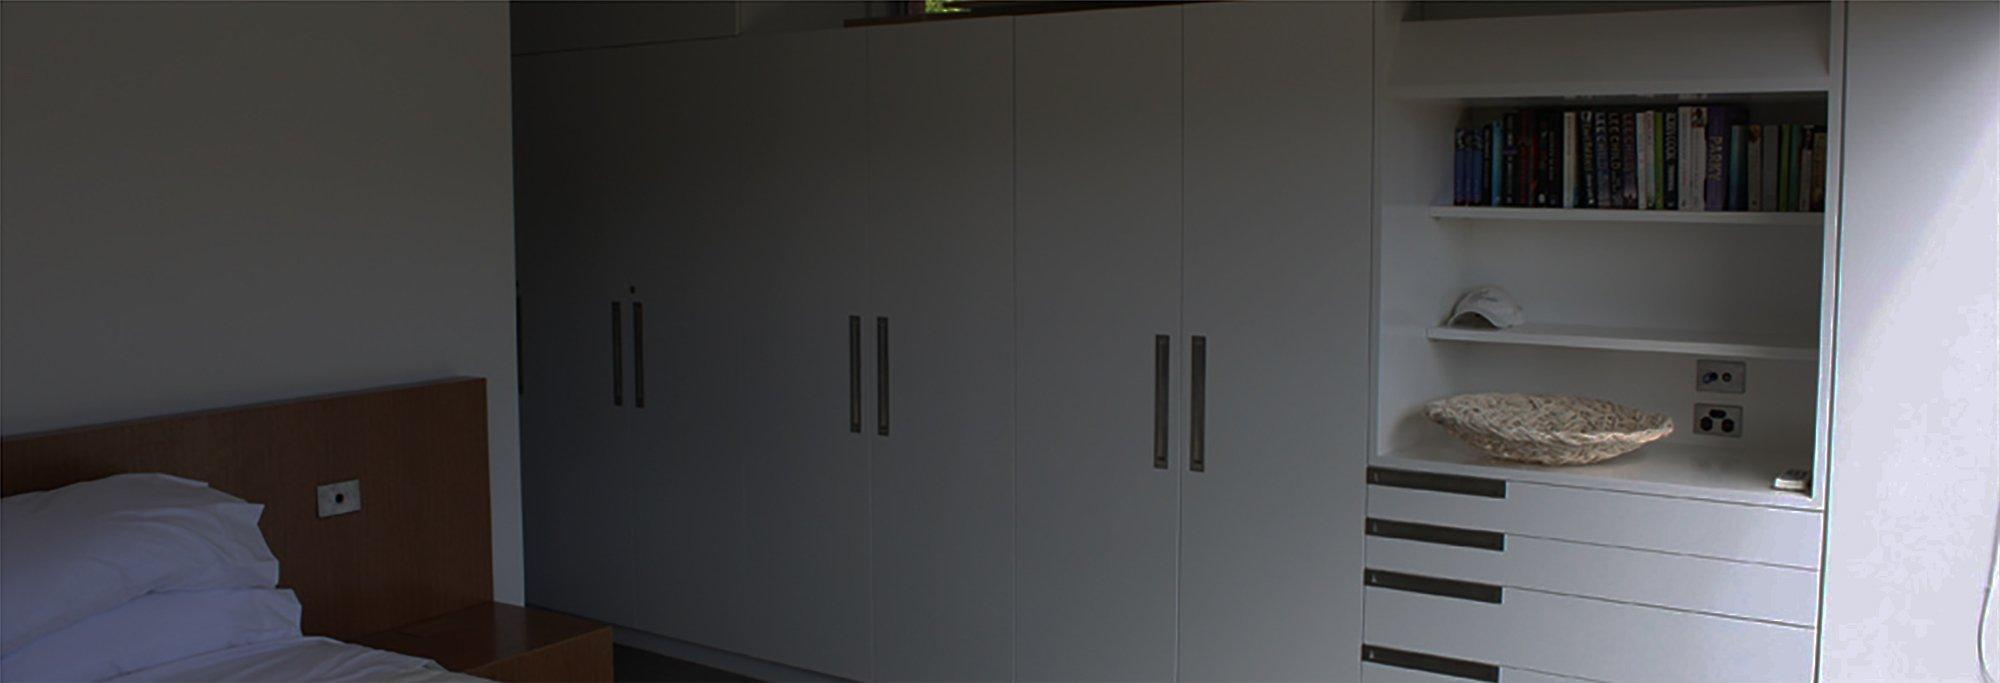 Custom furniture designed for the house